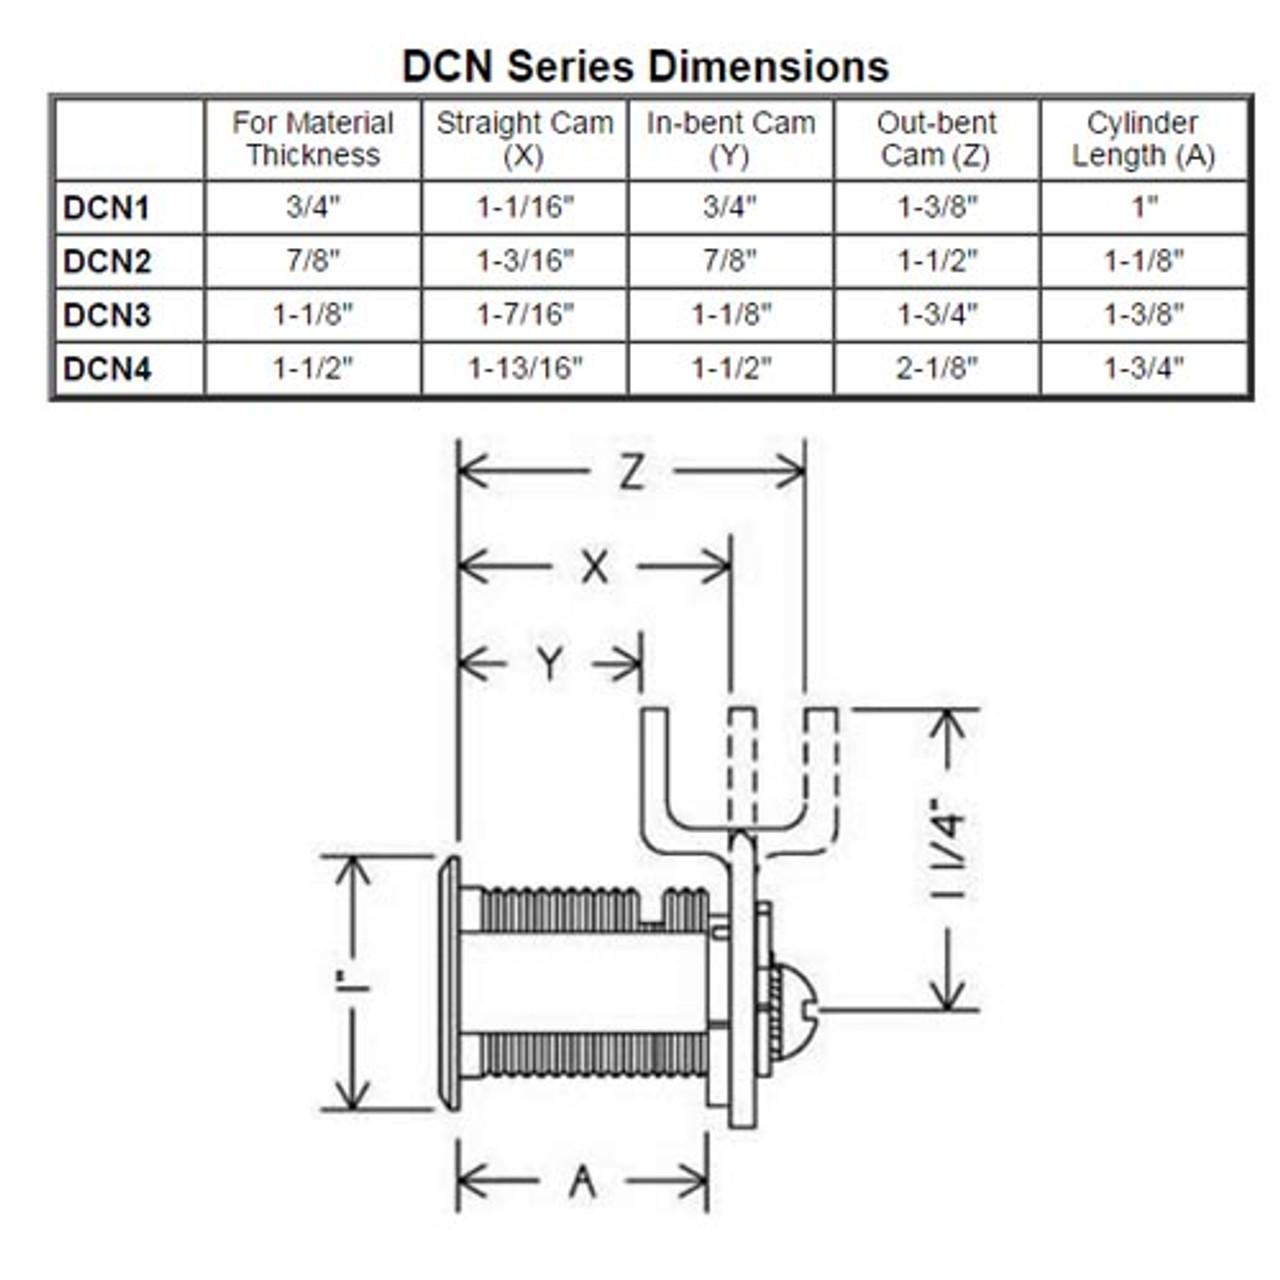 Olympus DCN3-MK-26D N Series Master Keyed Reversible Cam Lock in Satin Chrome